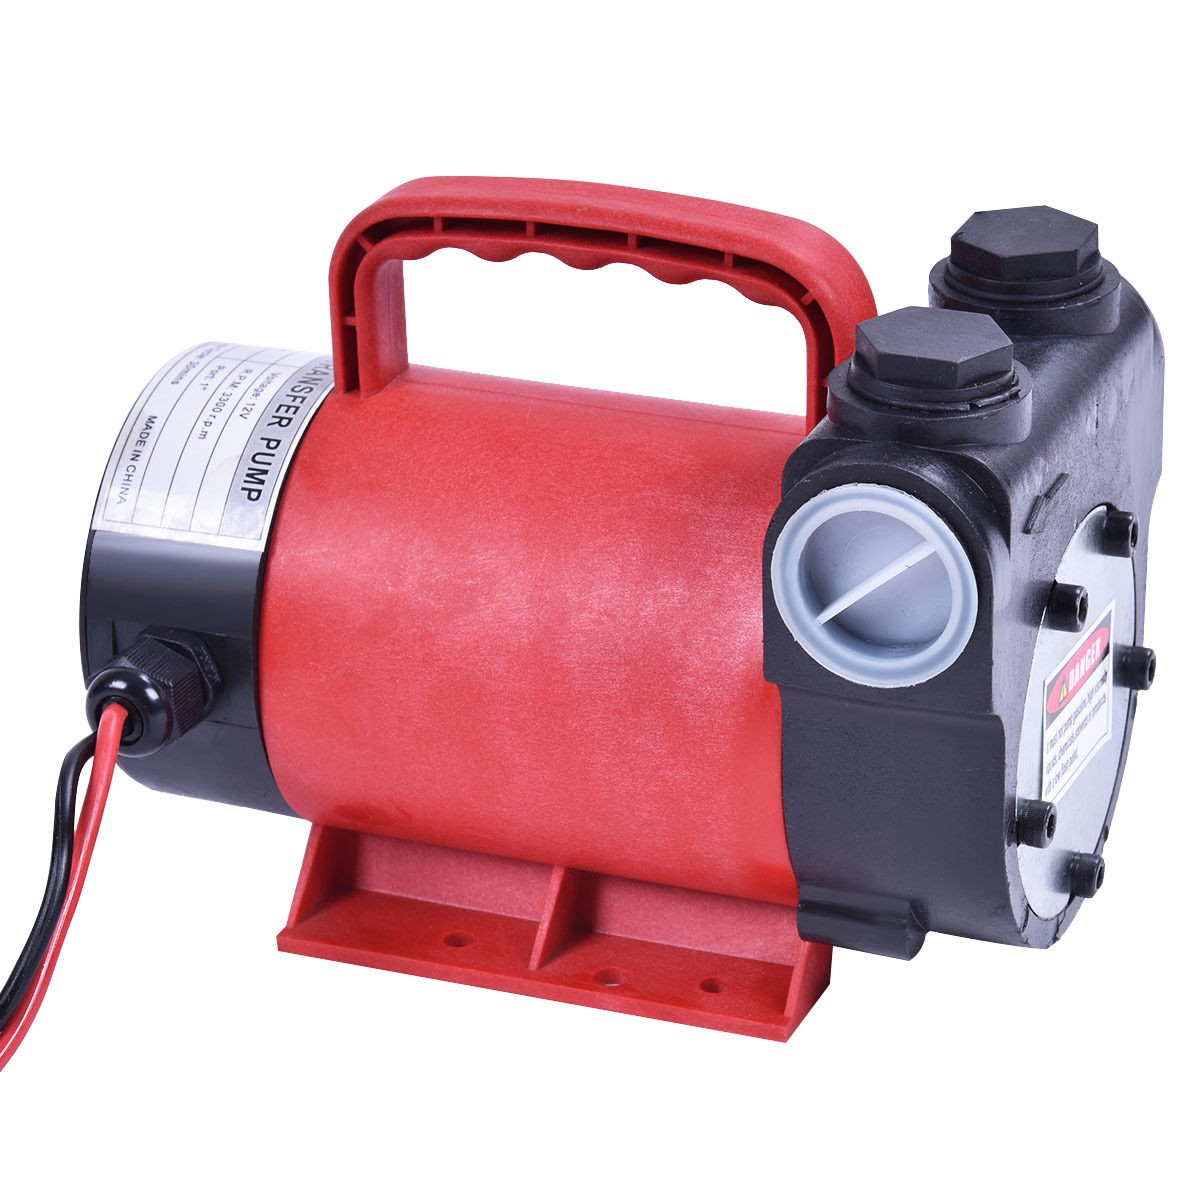 Portable Gas Pump : Portable v gpm electric diesel oil fuel transfer